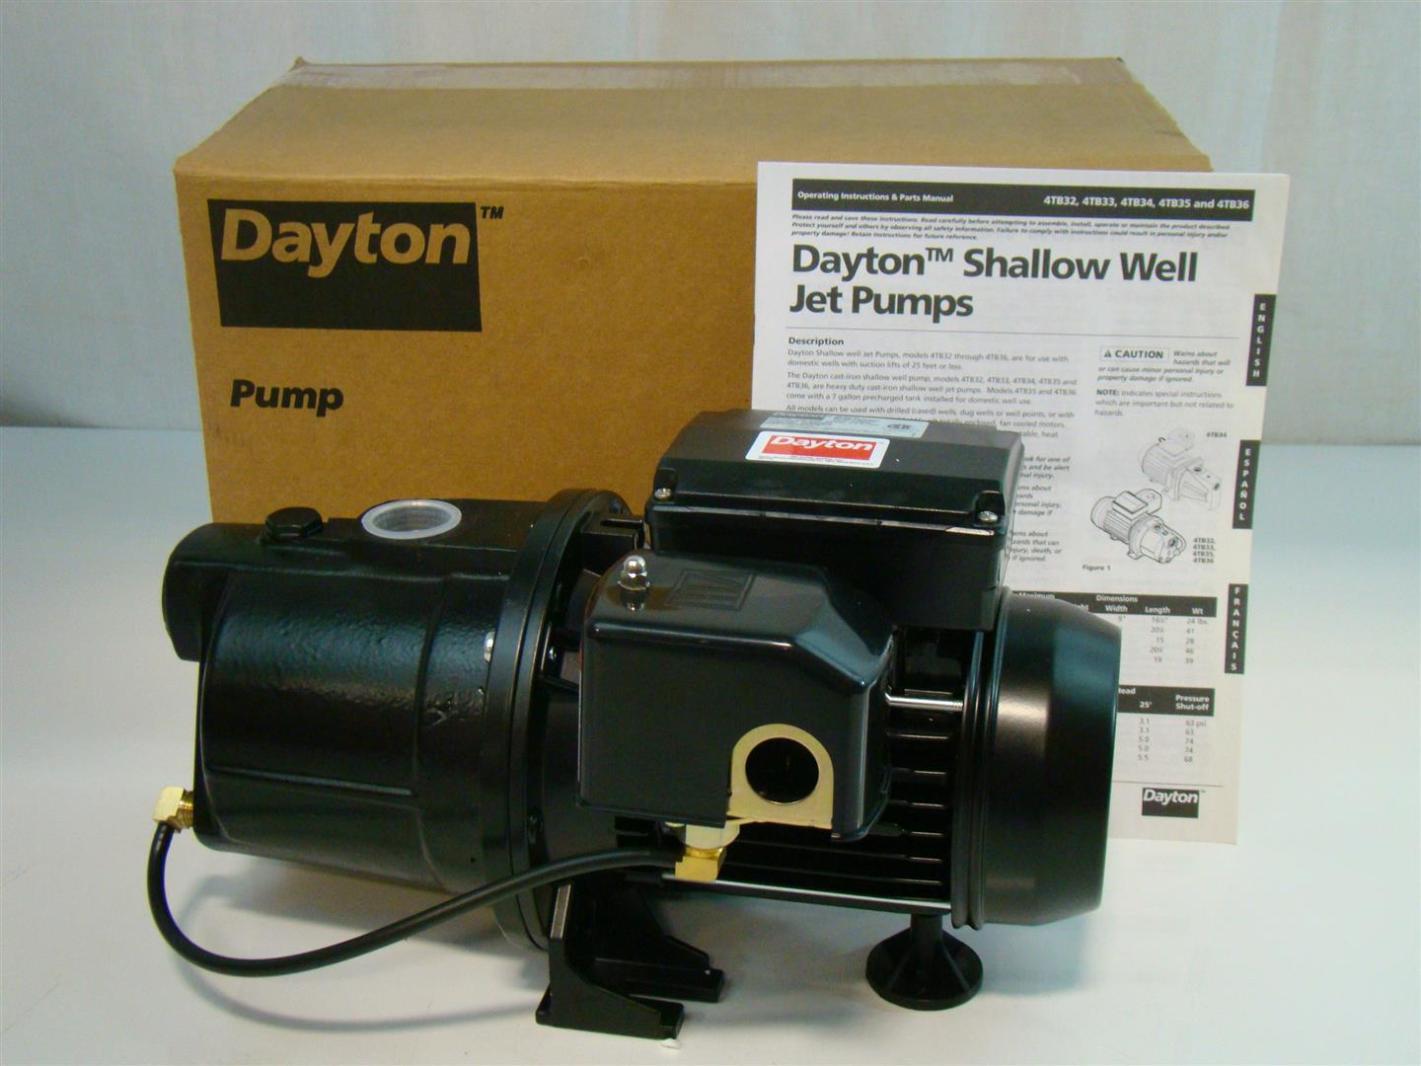 Dayton Shallow Well Jet Pump 1 2hp 115v 7 2amps 4tb32 Ebay